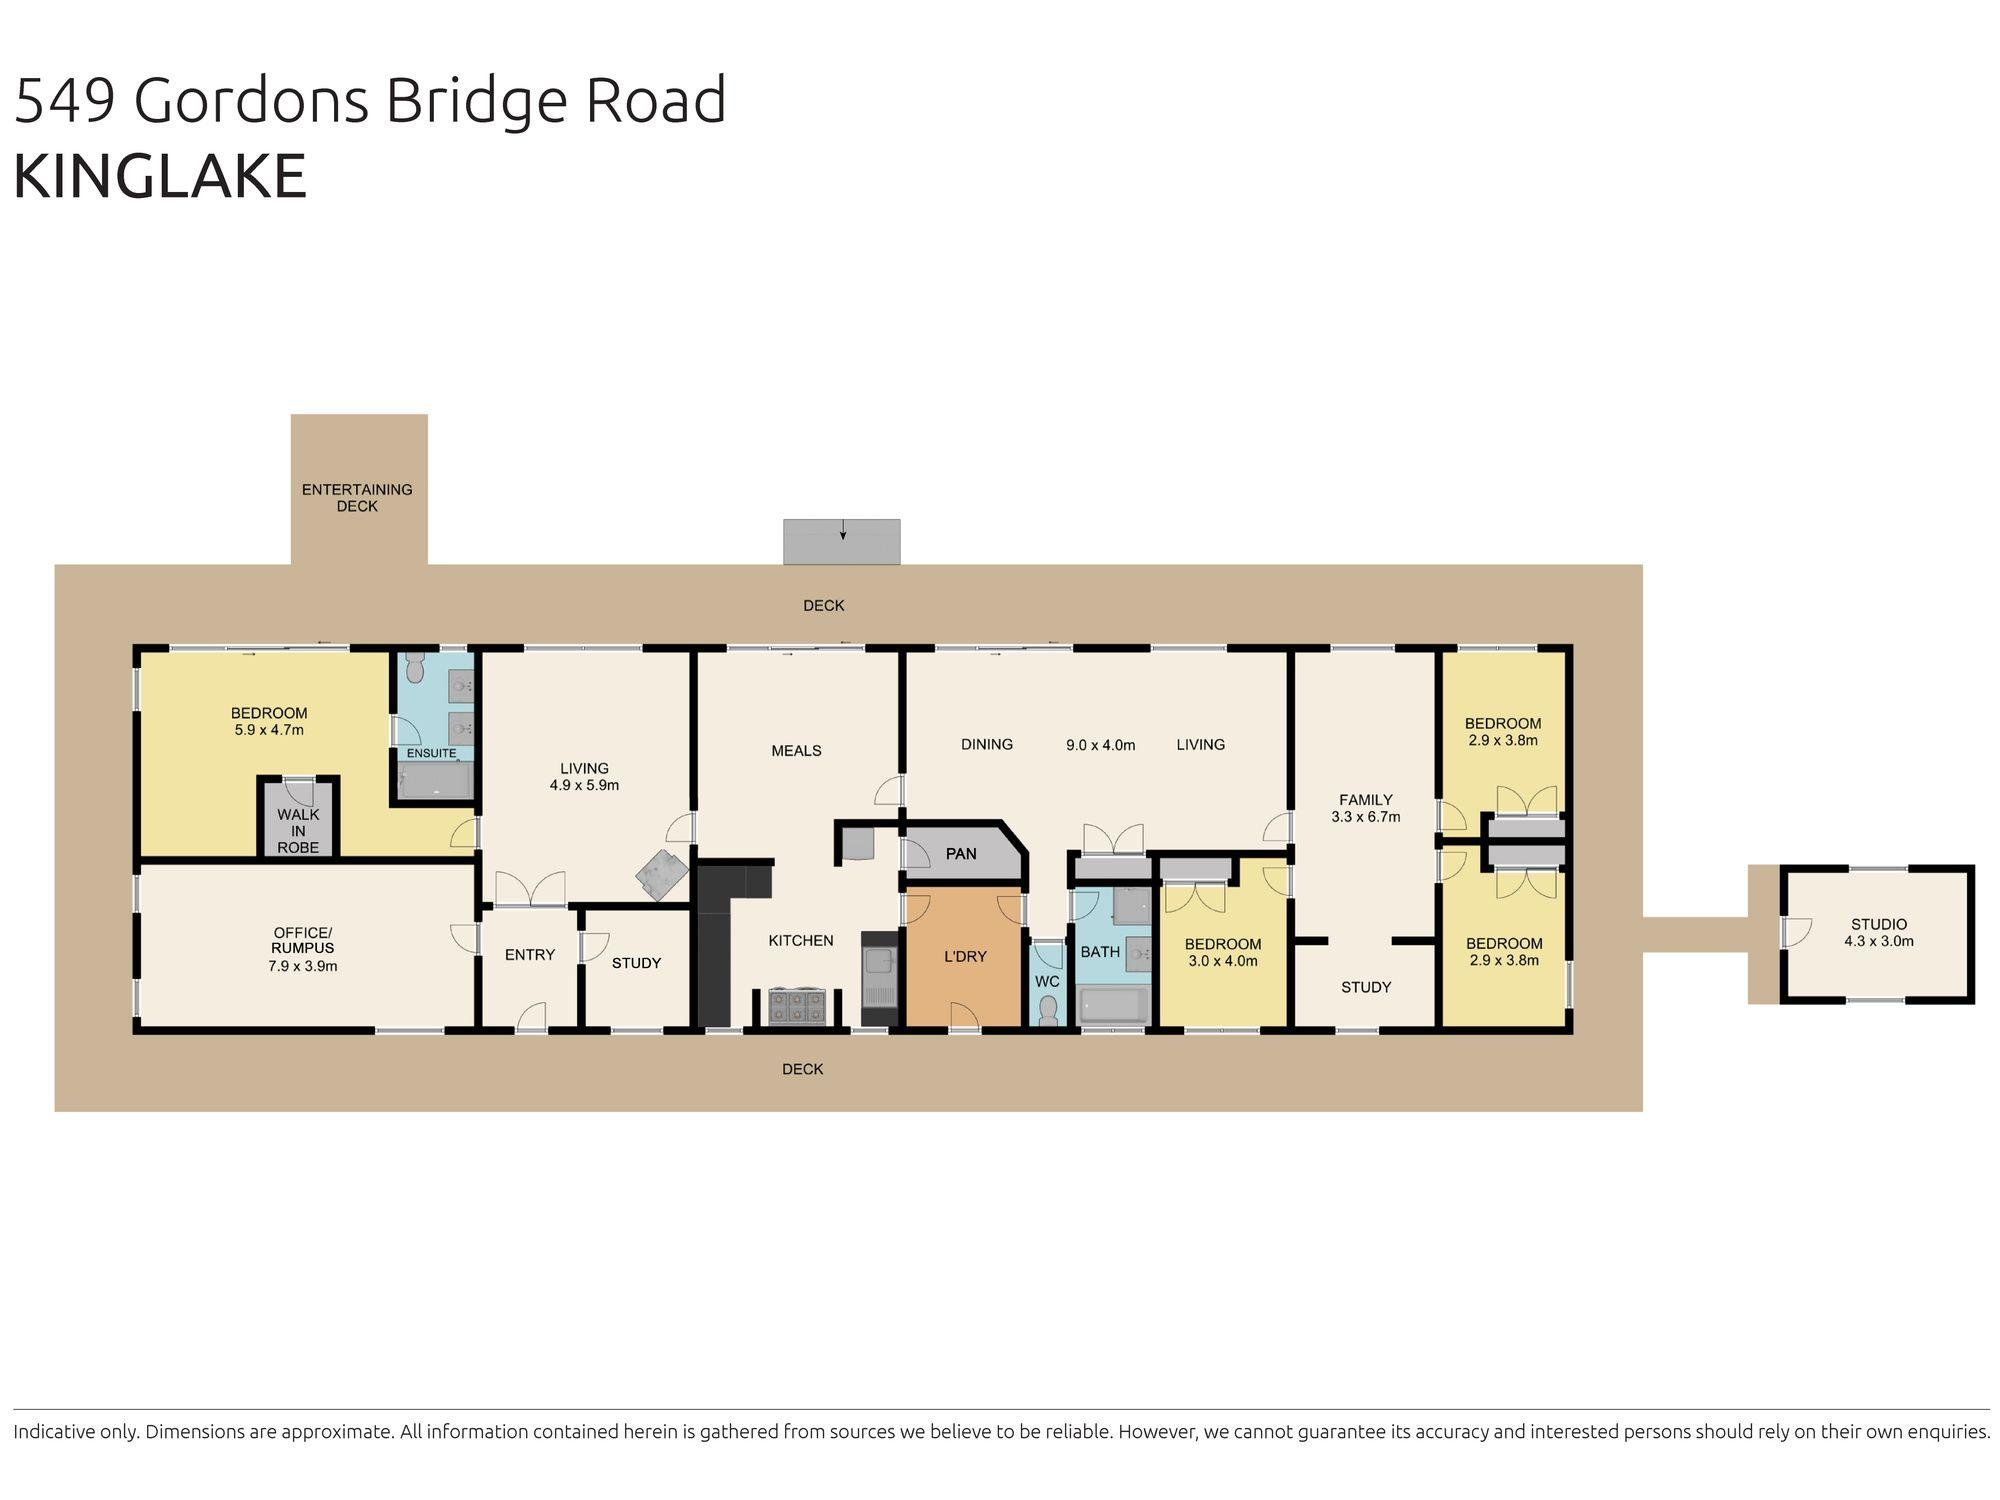 549 Gordons Bridge Road Kinglake